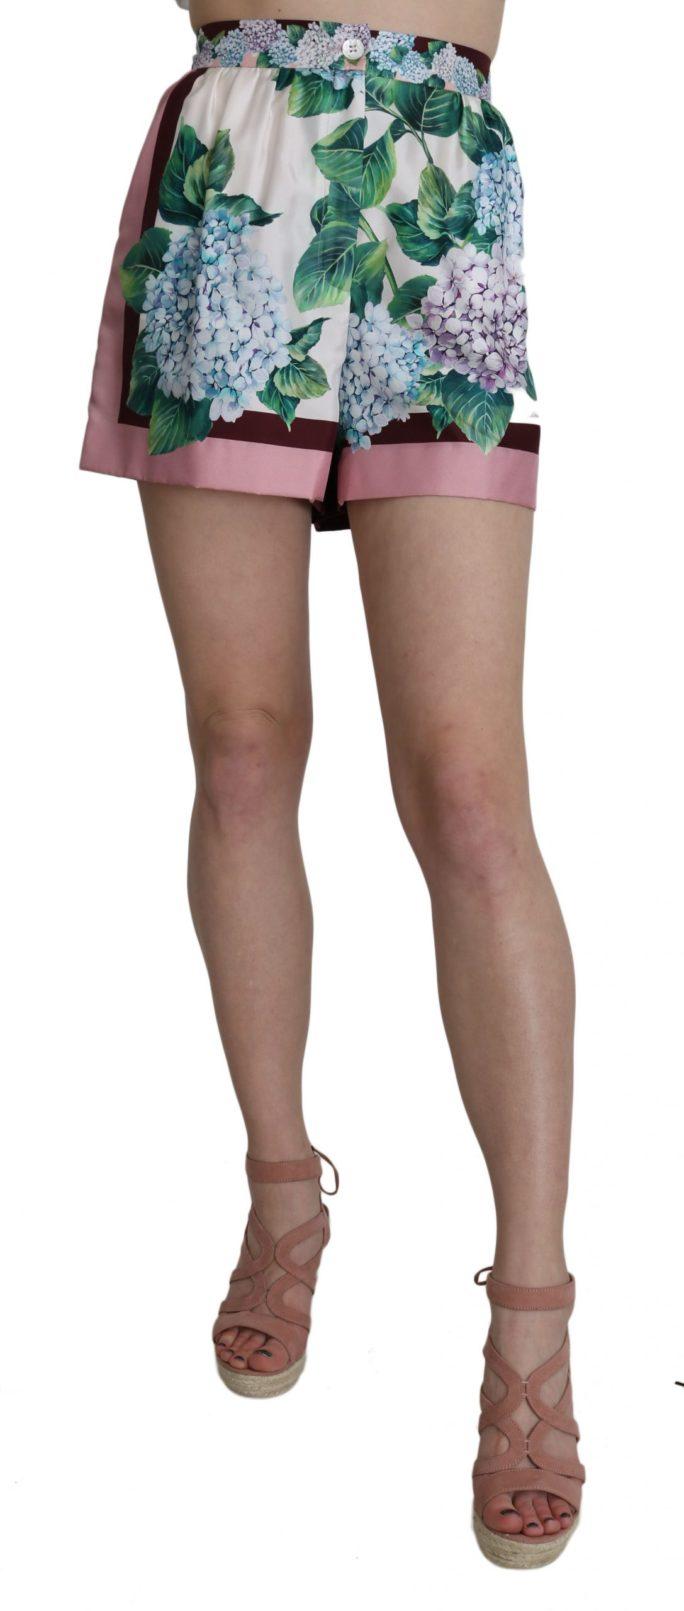 657993 Hydrangea High Waist Floral Print Silk Shorts.jpg